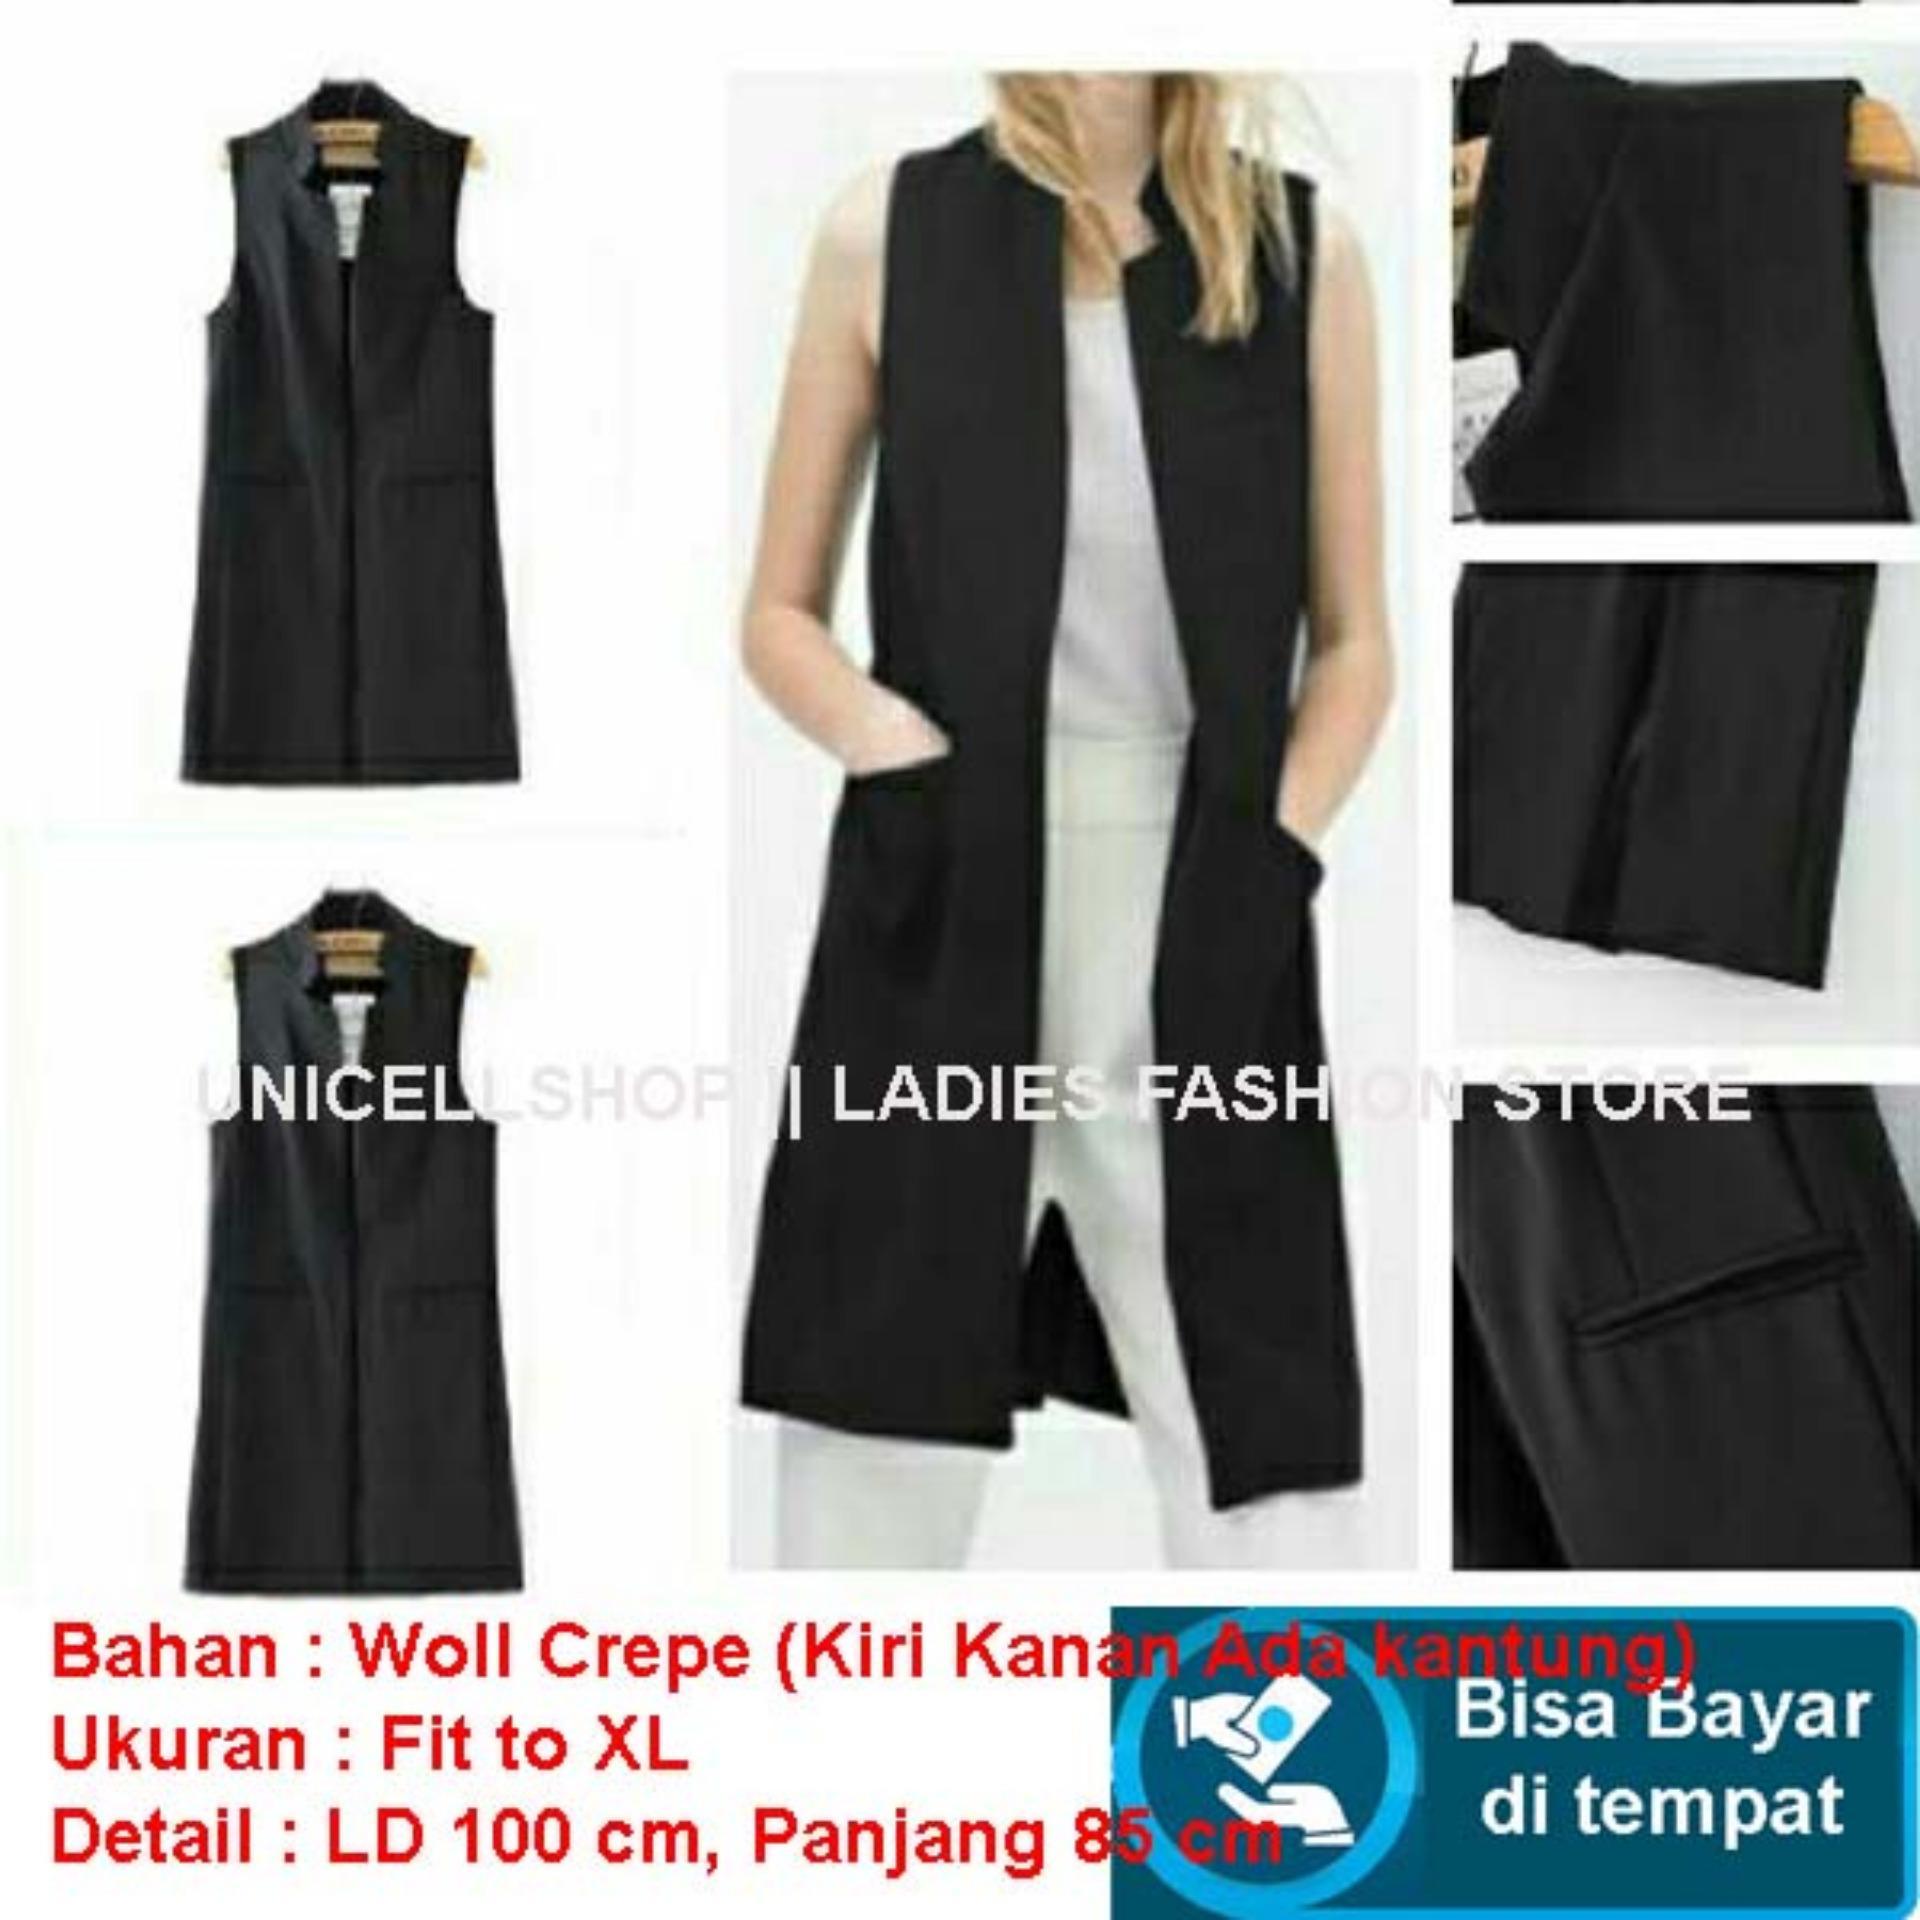 Blazer Panjang Wanita Vest Ignacia / Cardingan / Long Vest Coat / Outwear terusan wanita NR